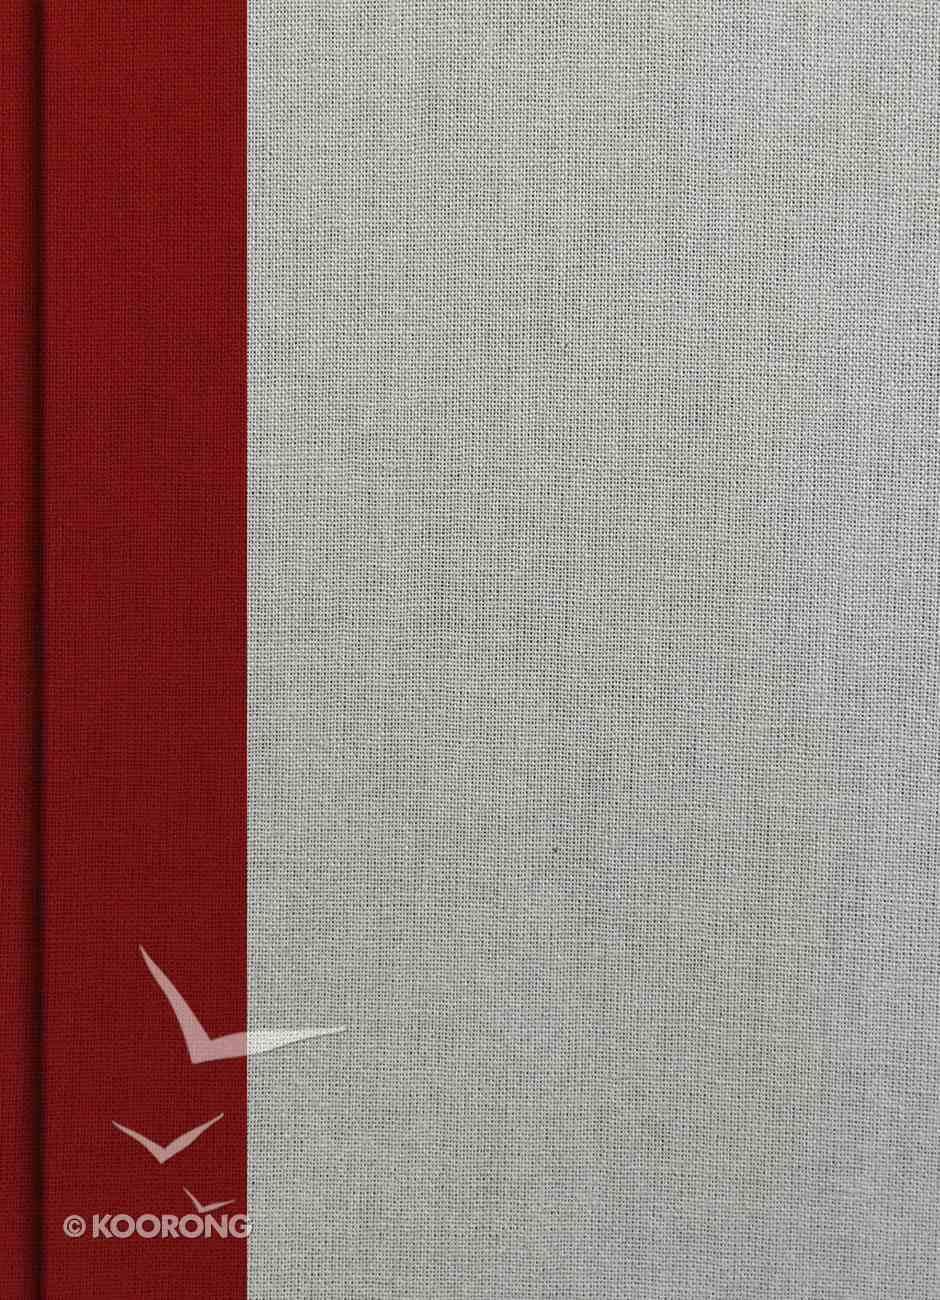 KJV Study Bible Crimson/Gray Hardback